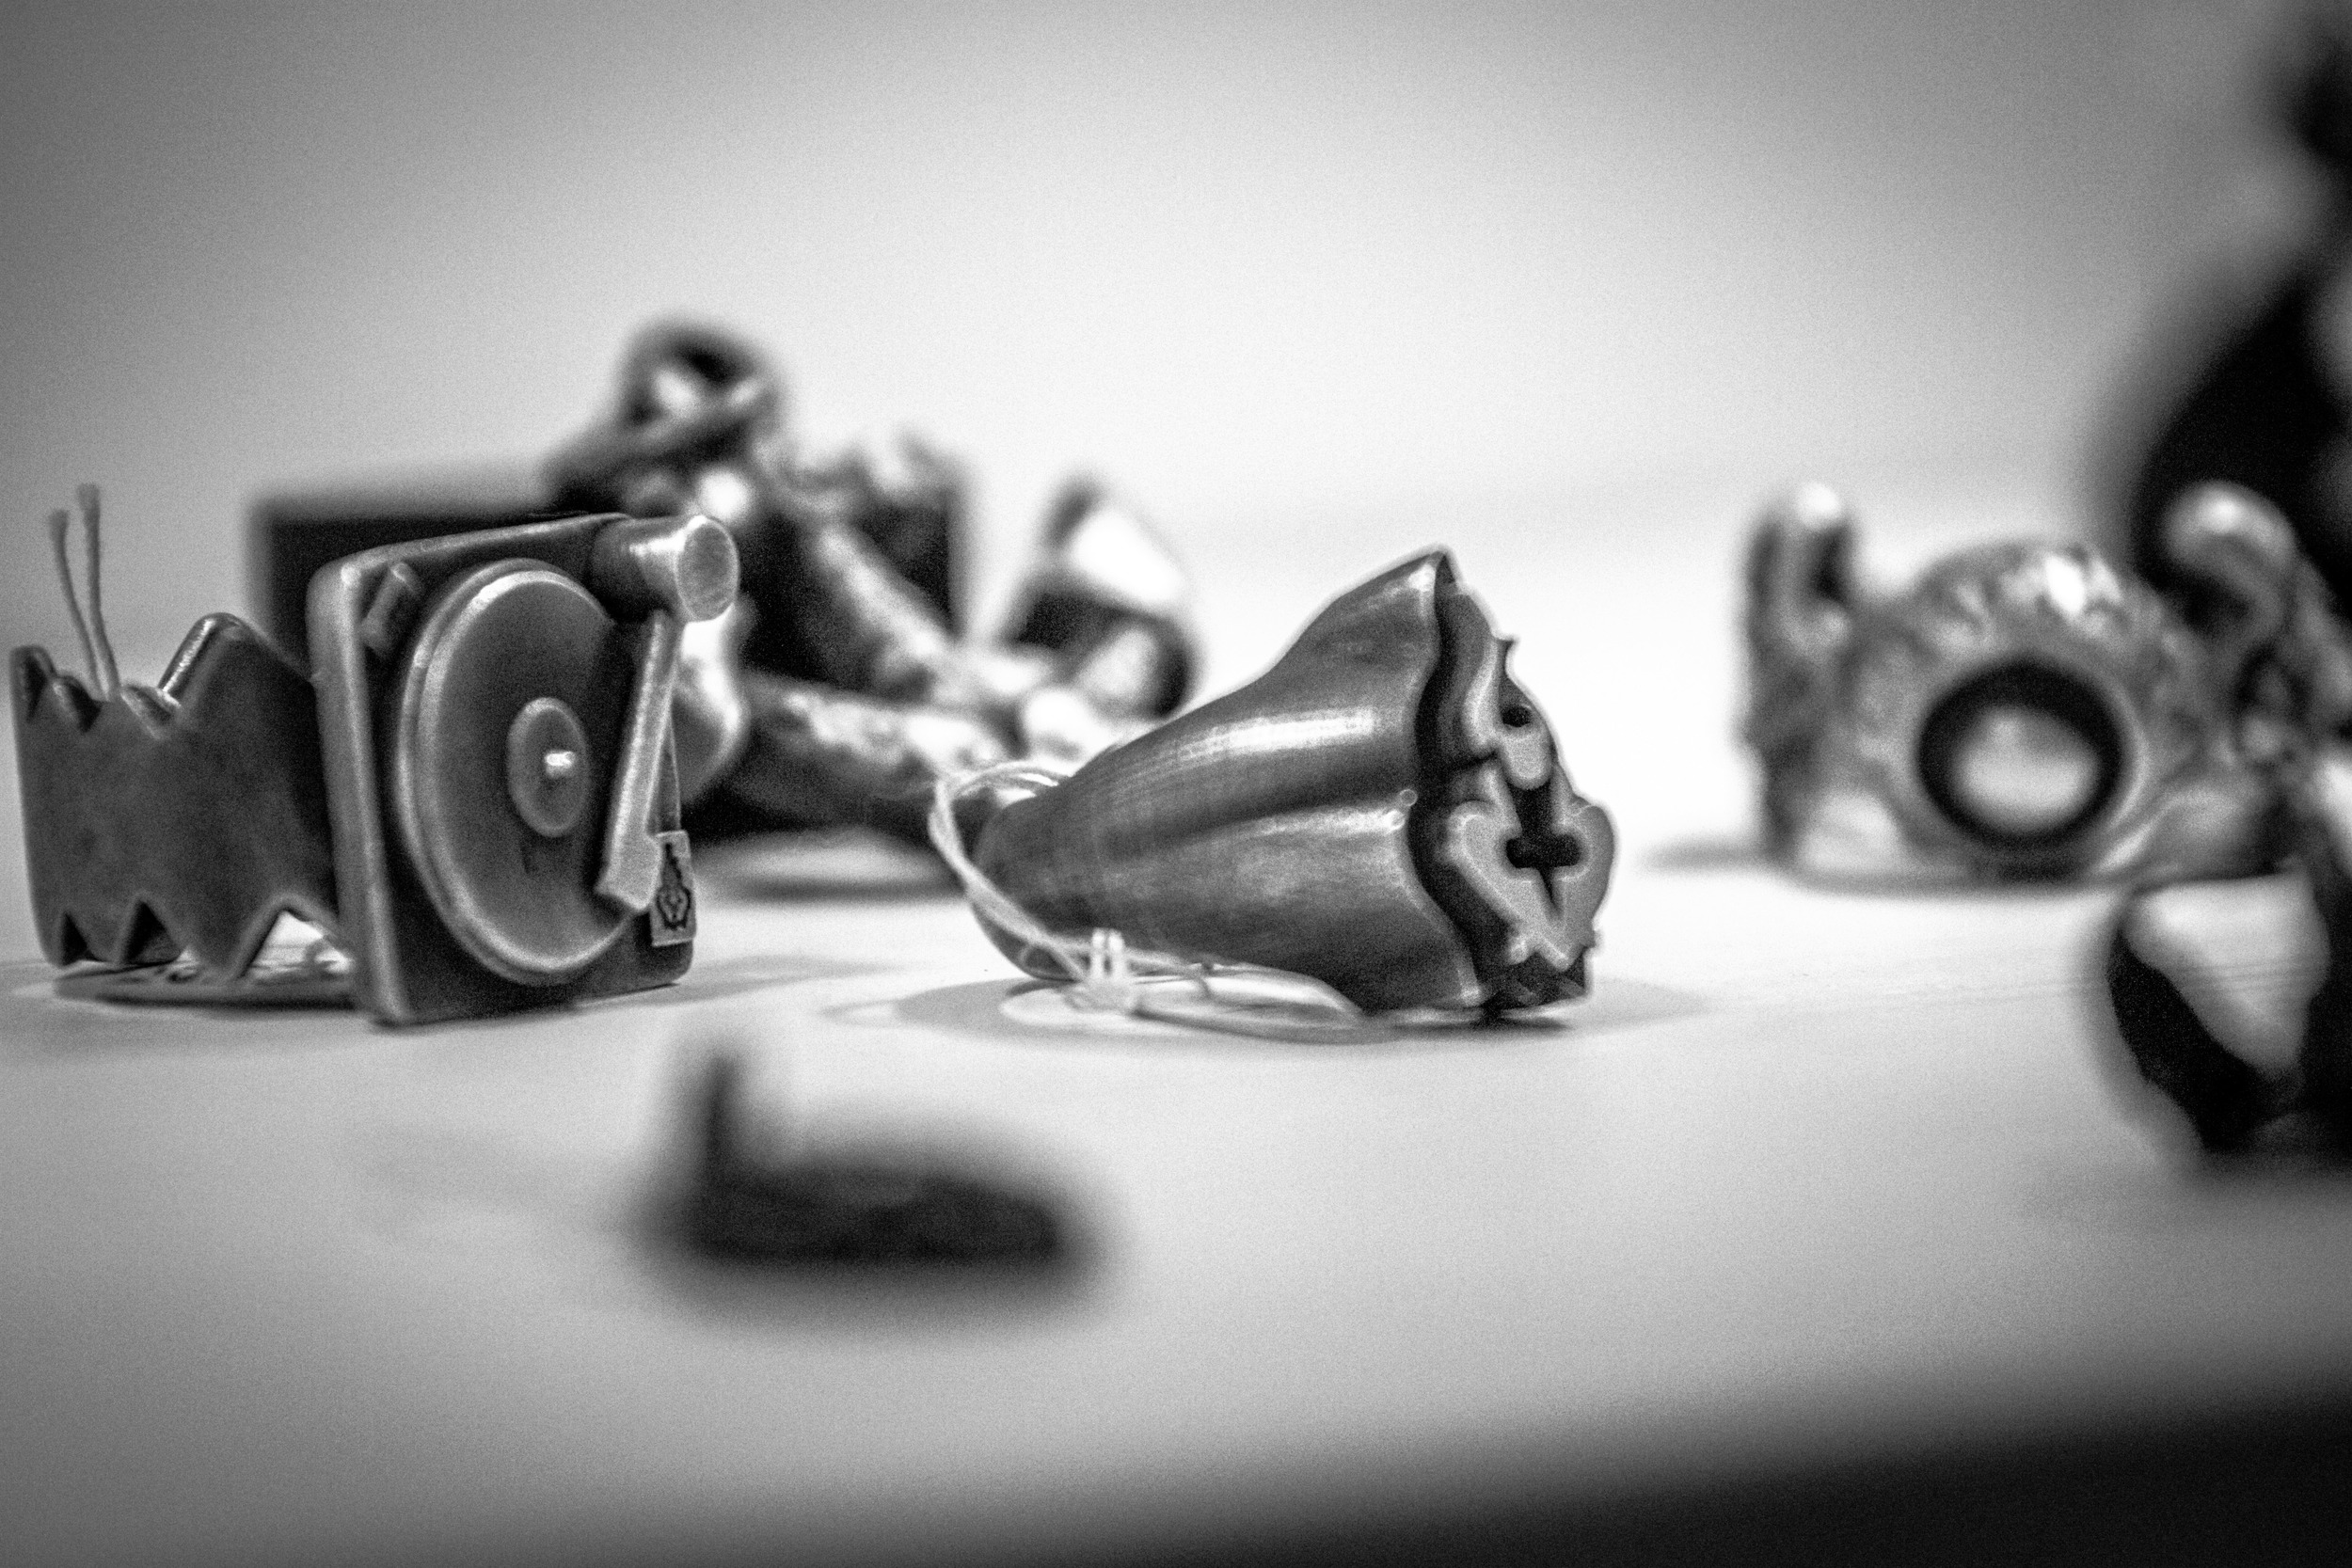 rohstoff by Dirk Behlau-2712.jpg